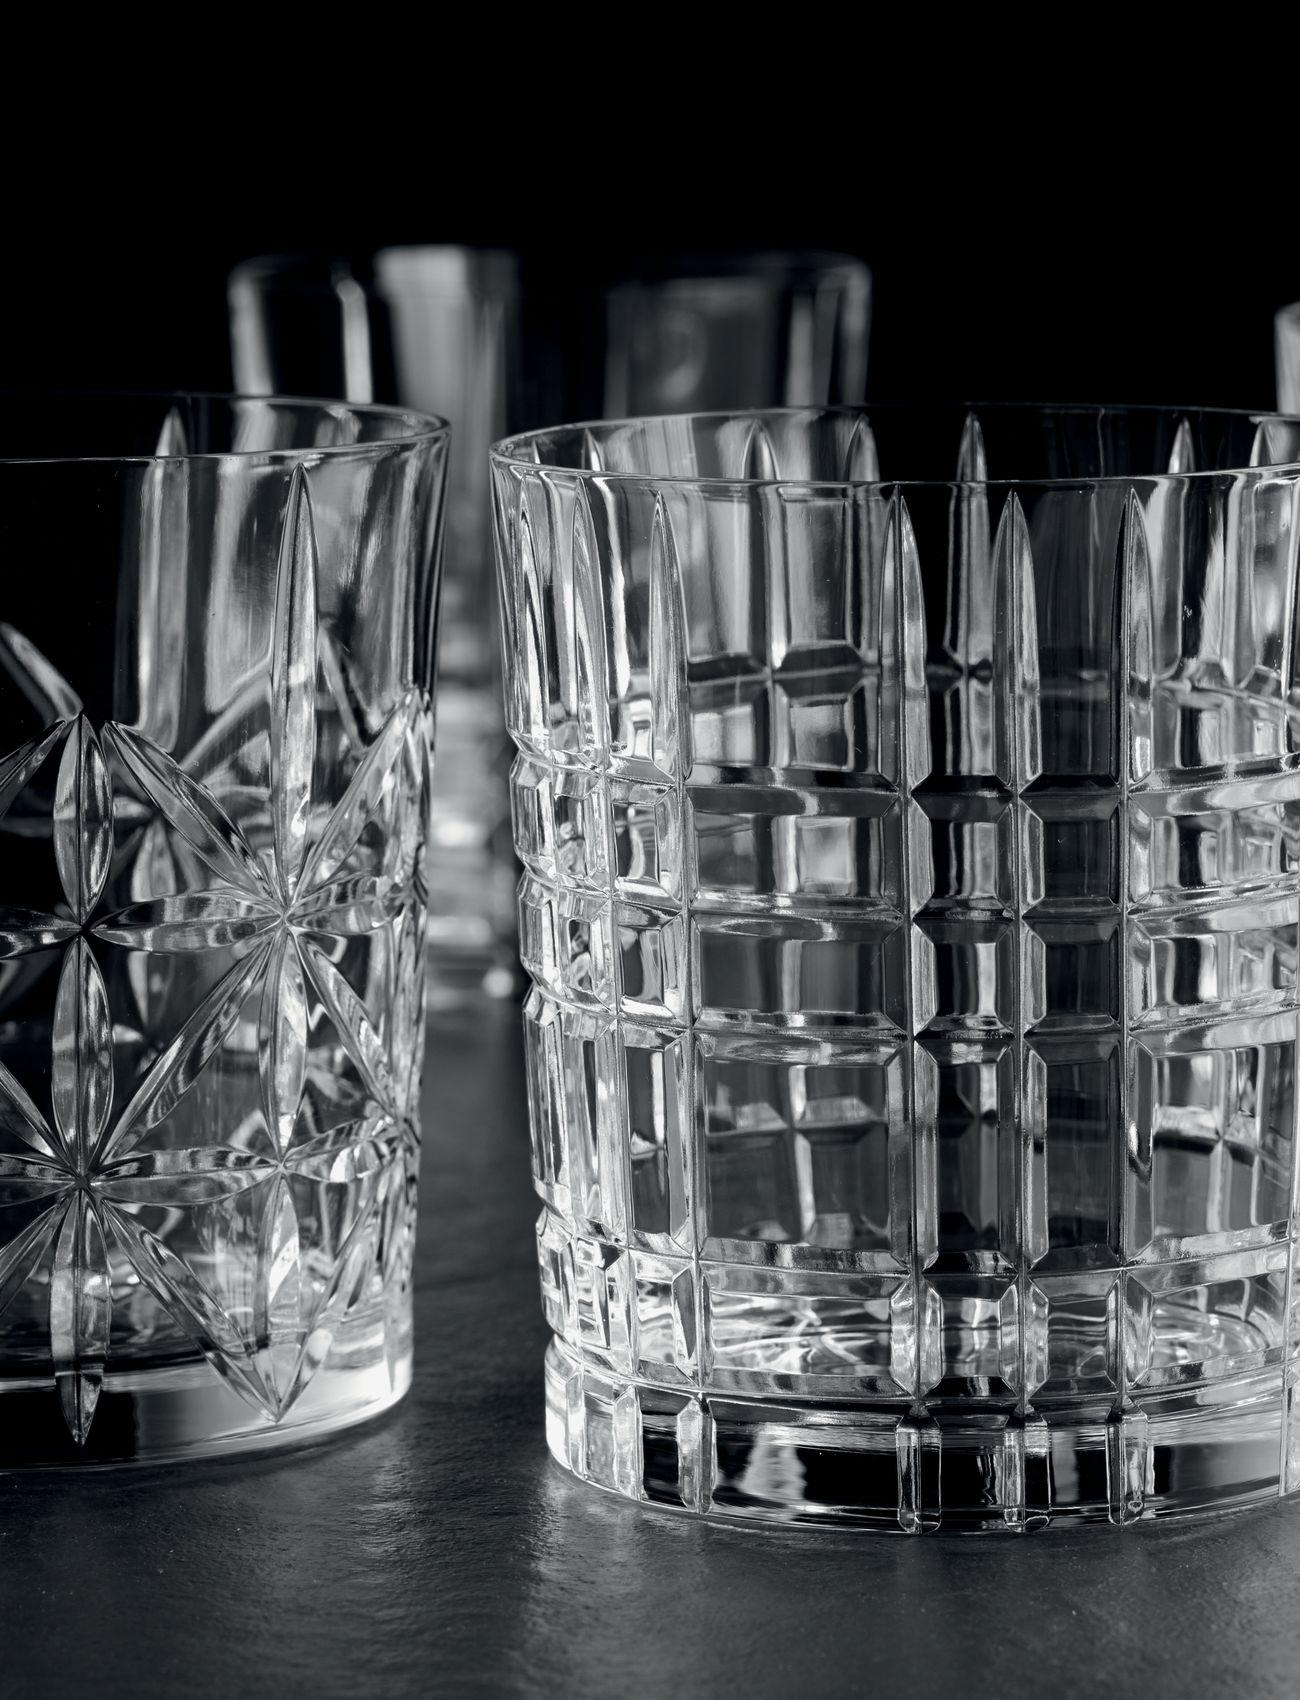 Nachtmann - Highland Tumbler 34,5cl 4-p - whiskyglass & cognacglass - clear glass - 1